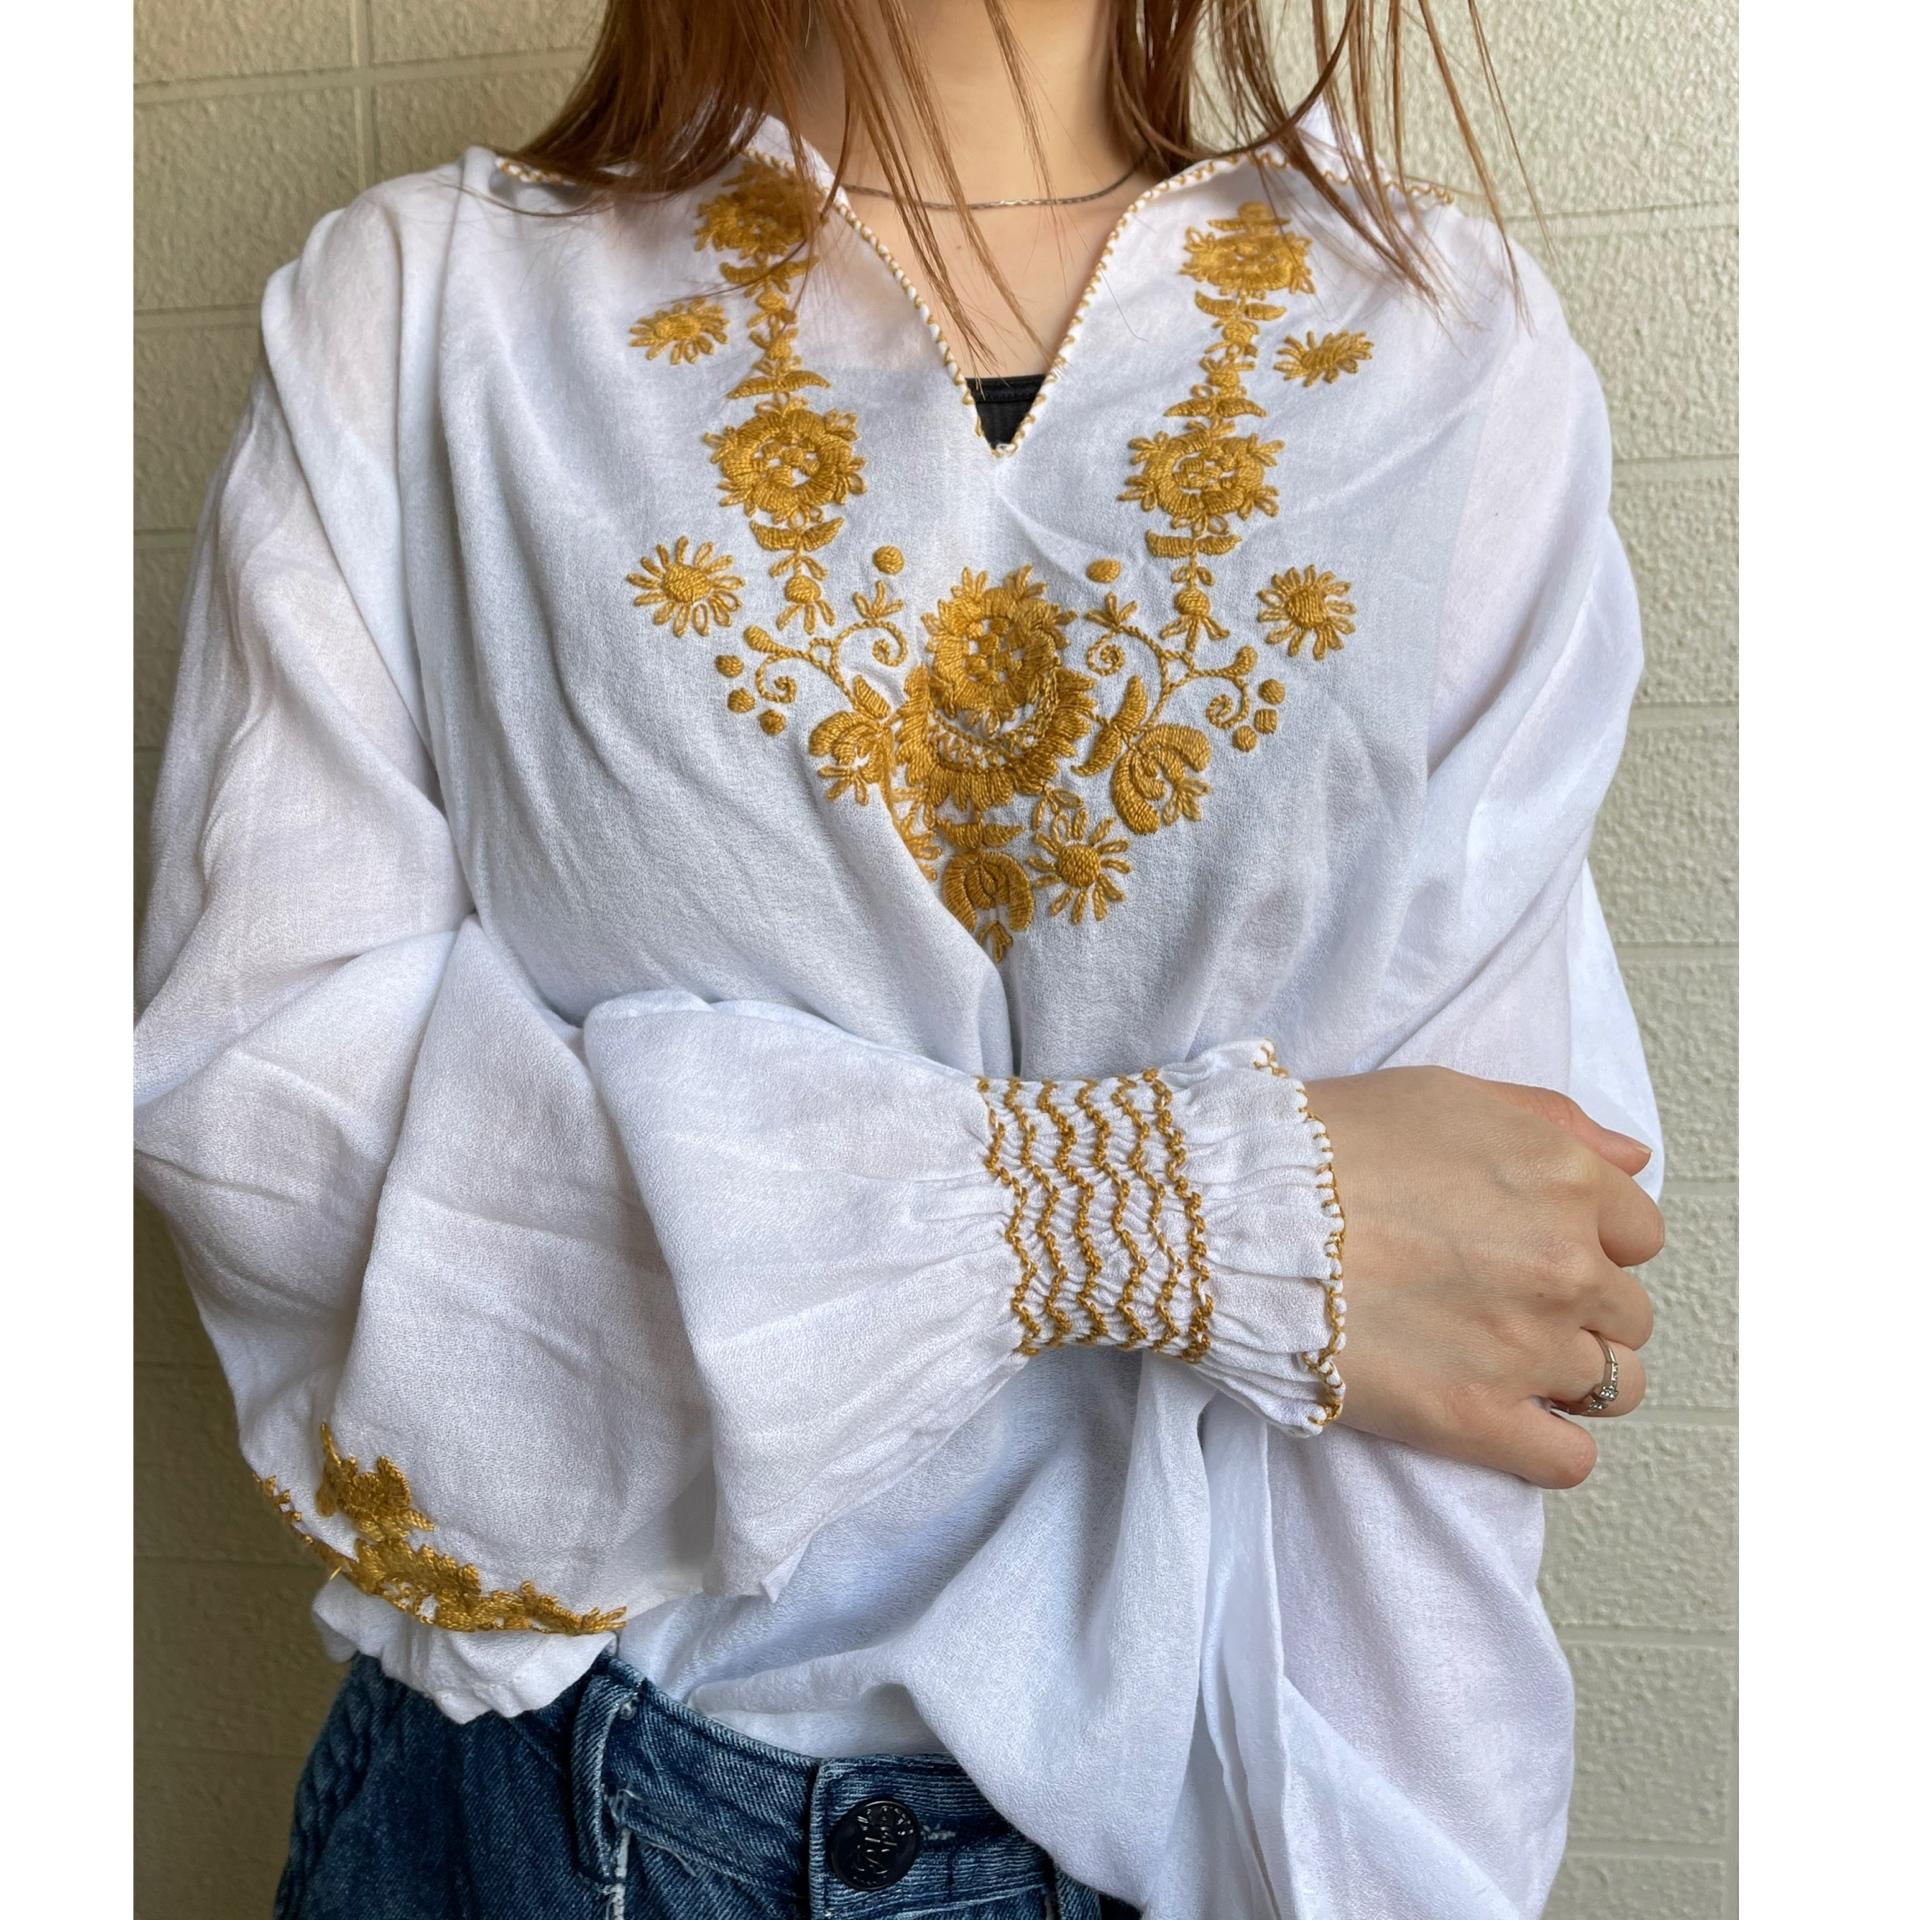 EURO embroidery skipper blouse